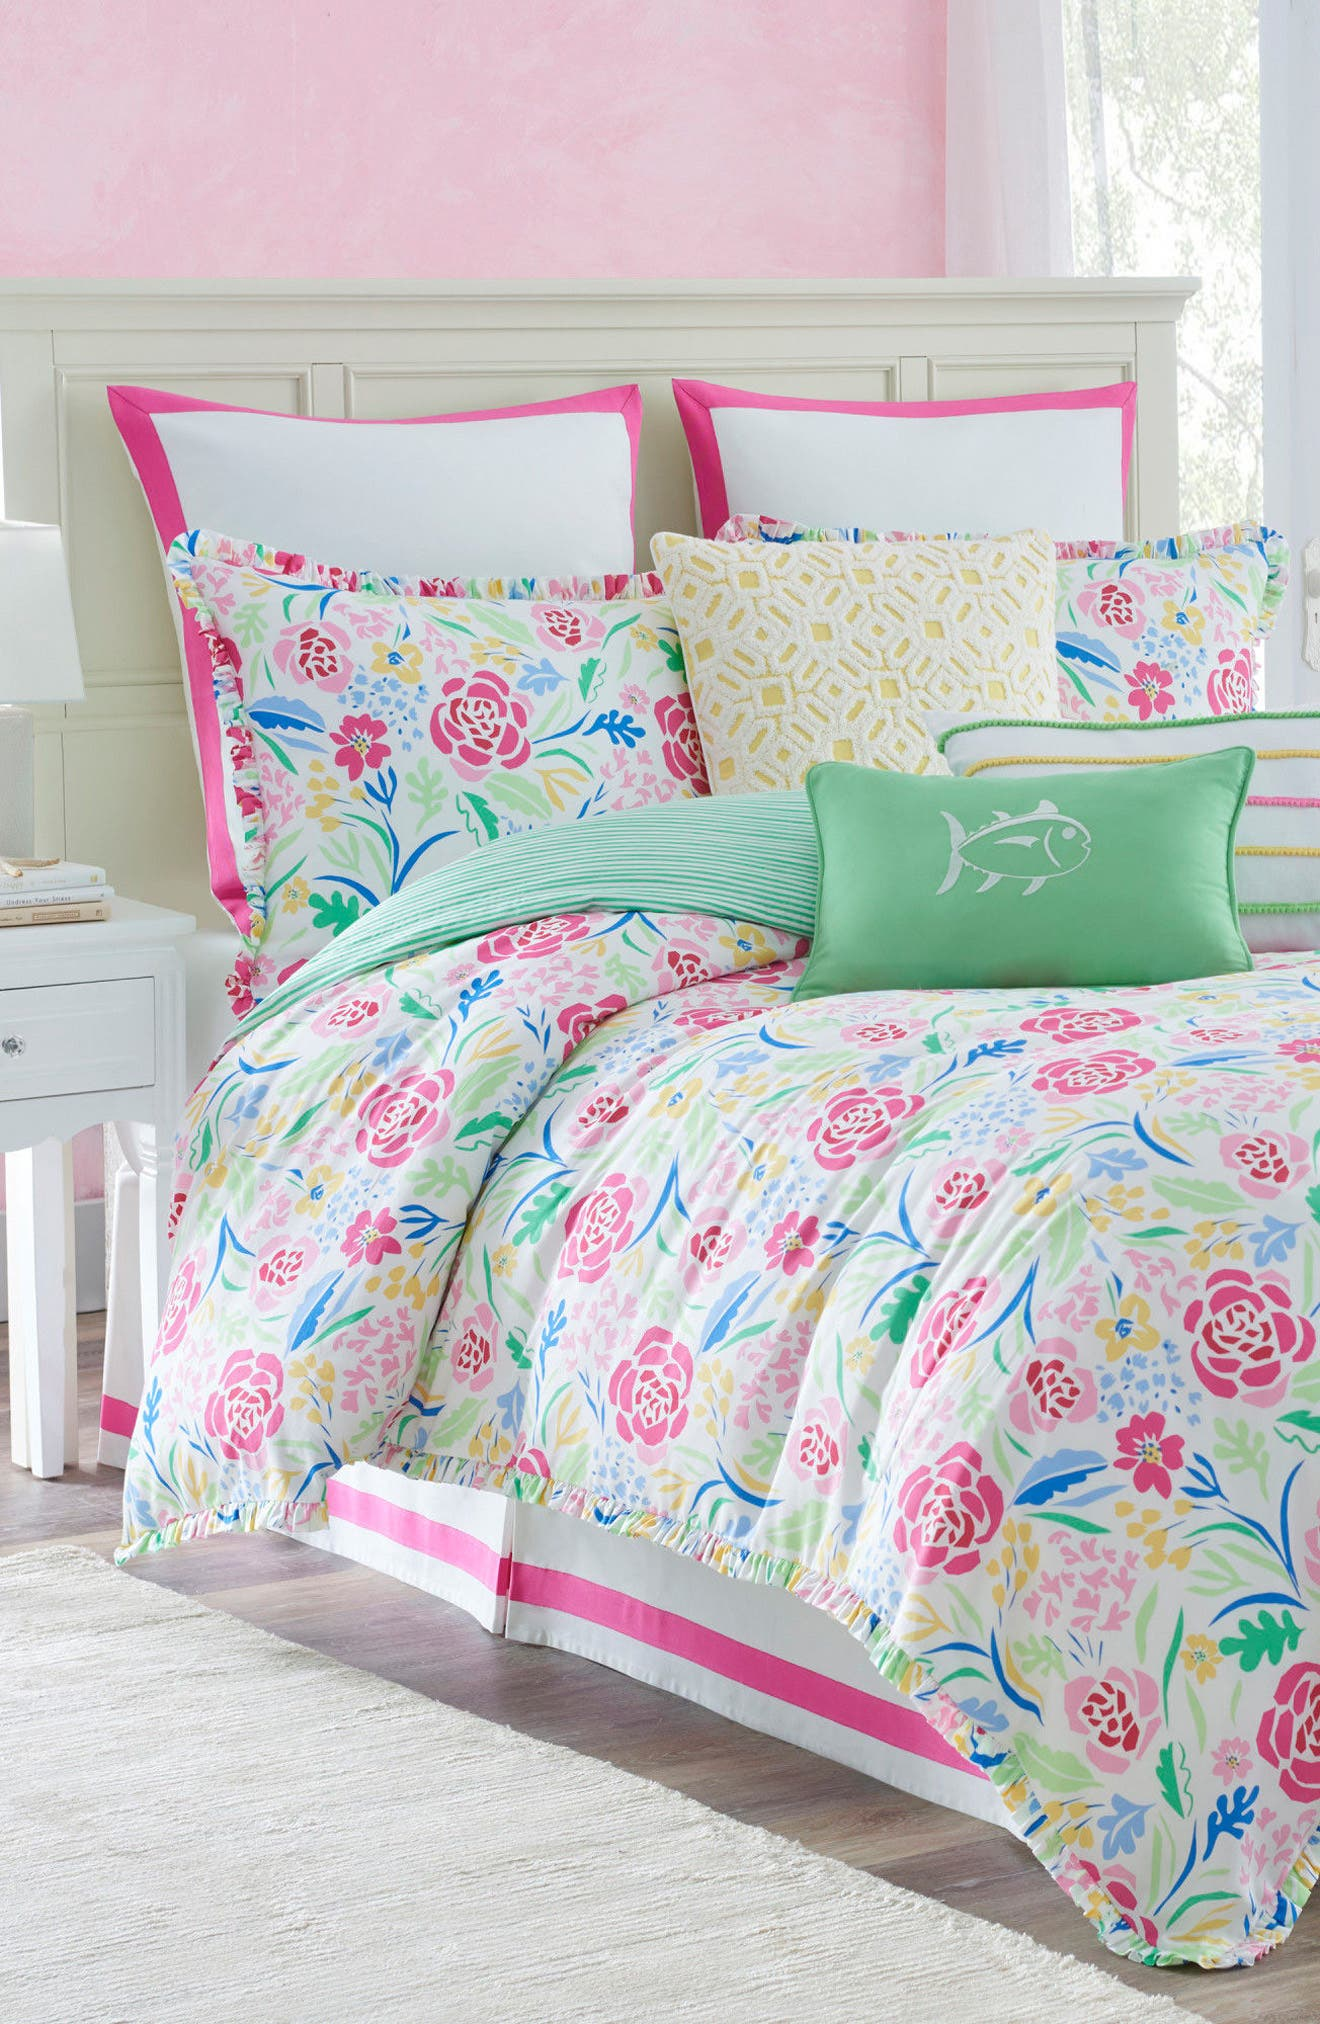 Kiawah Floral Comforter, Sham & Bed Skirt Set,                             Main thumbnail 1, color,                             100